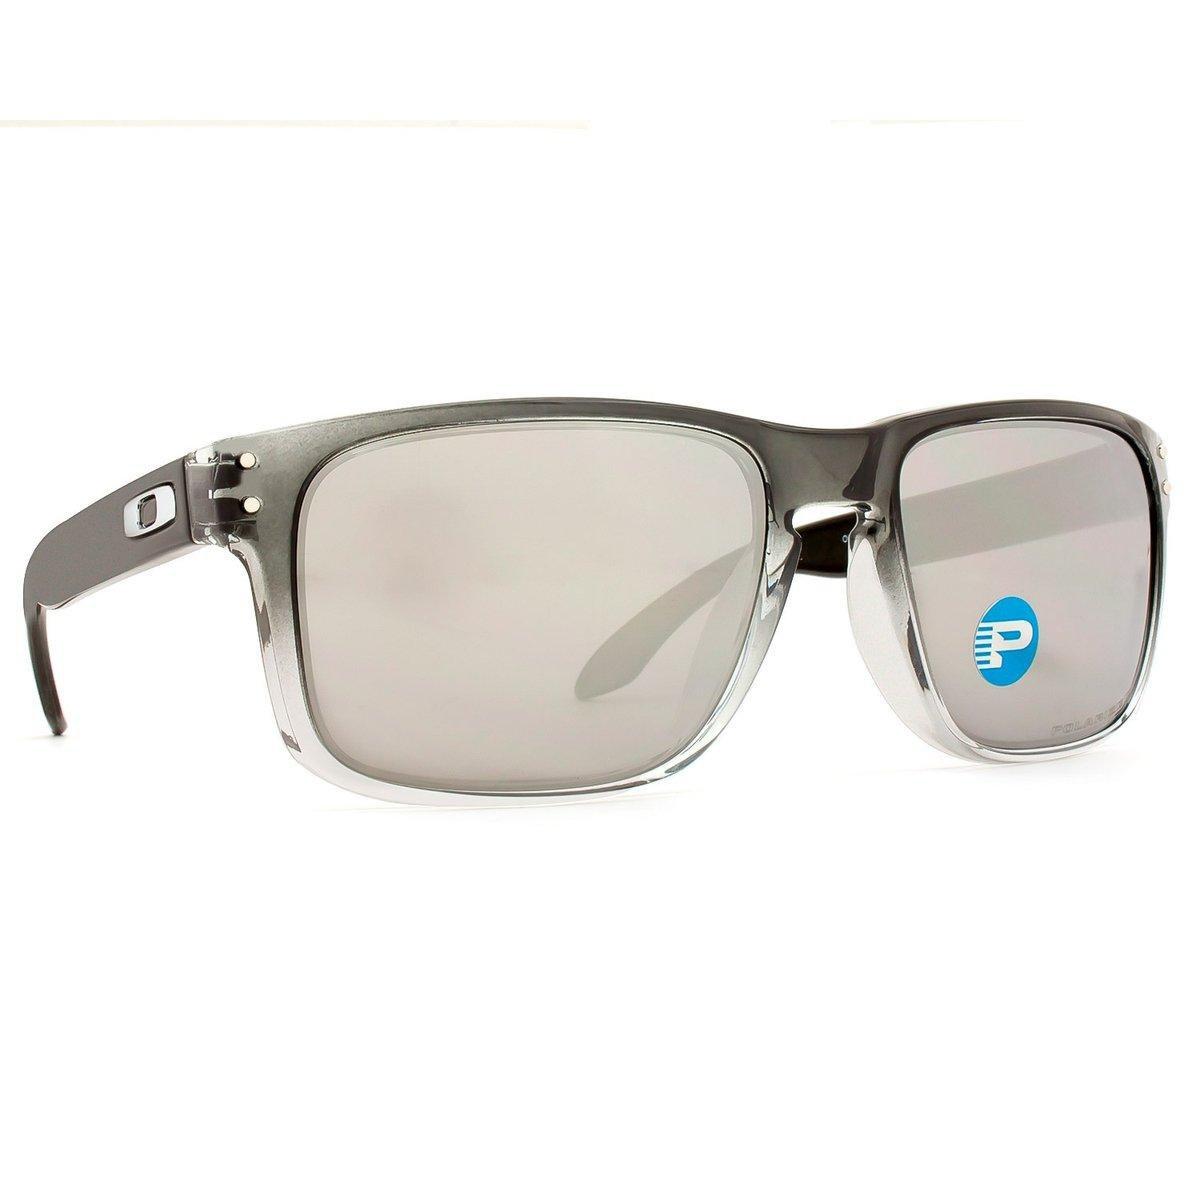 Óculos Oakley Holbrook Polarizado OO9102 A9 55 - Preto - Compre ... 19a511f917